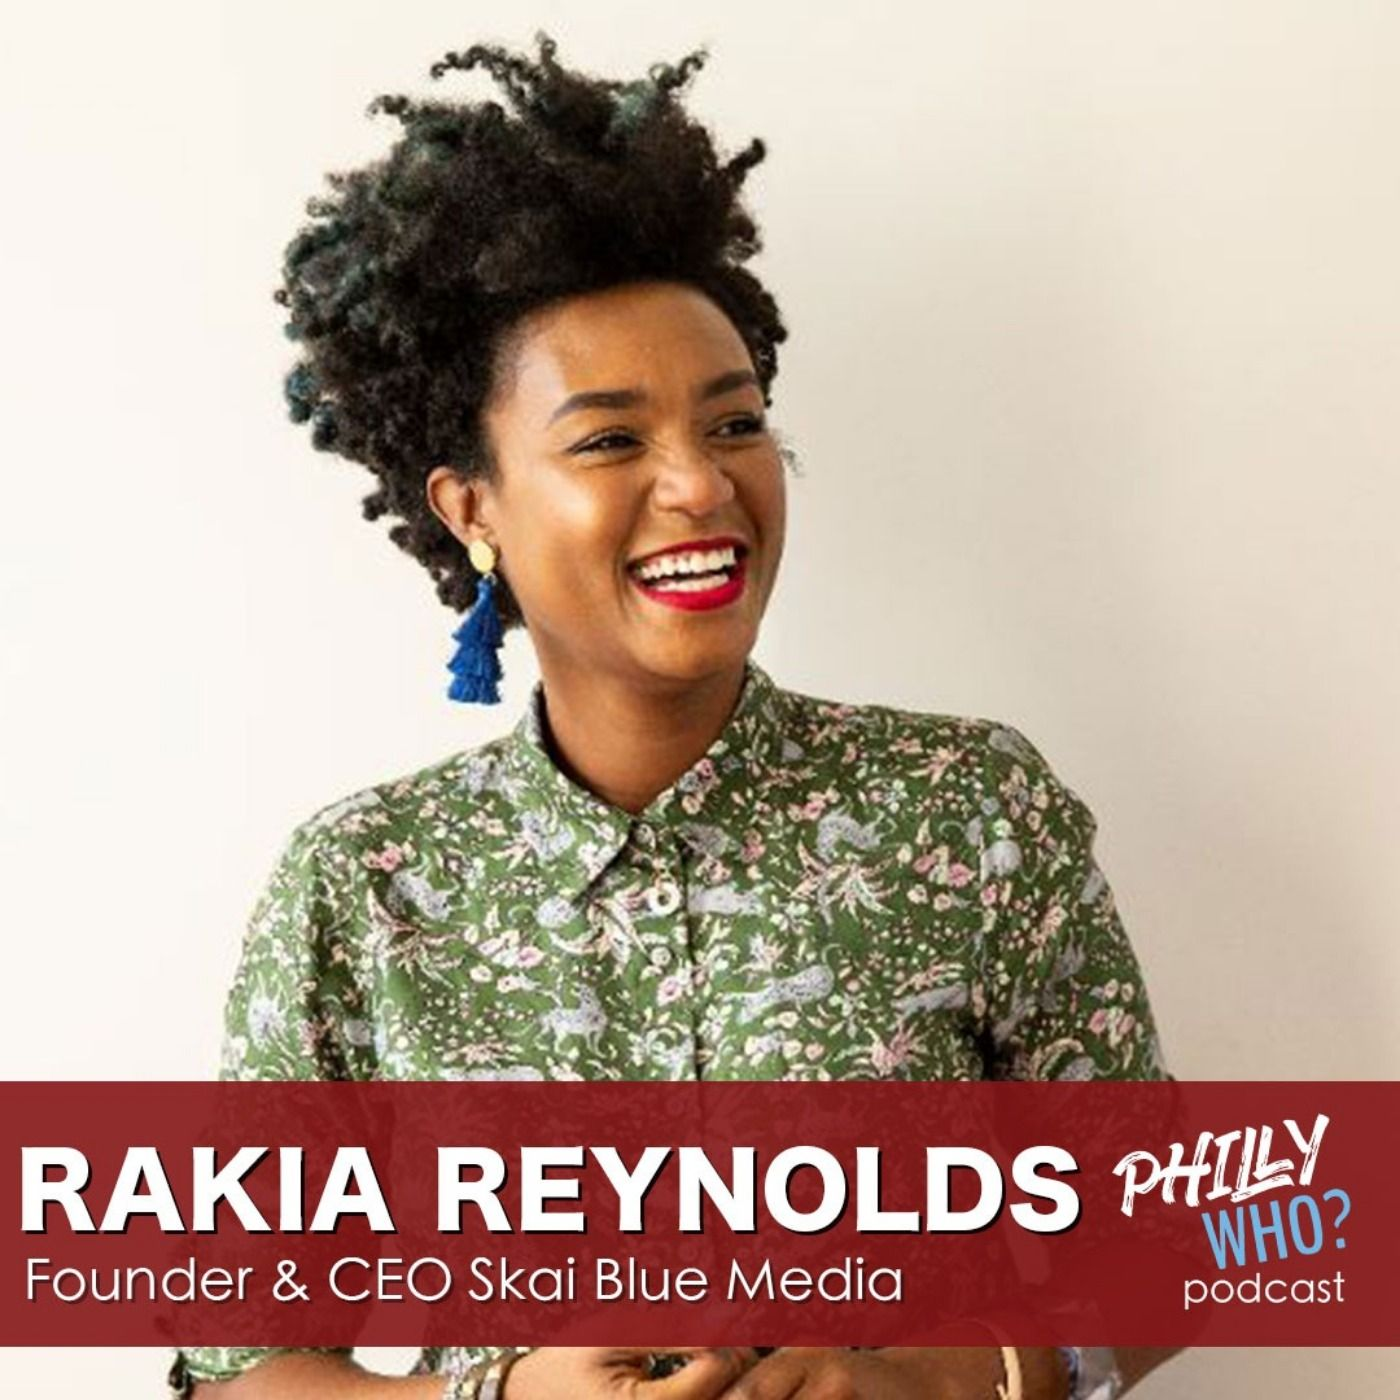 Rakia Reynolds: Helping Serena Williams & Other Celebrities Share Their Stories